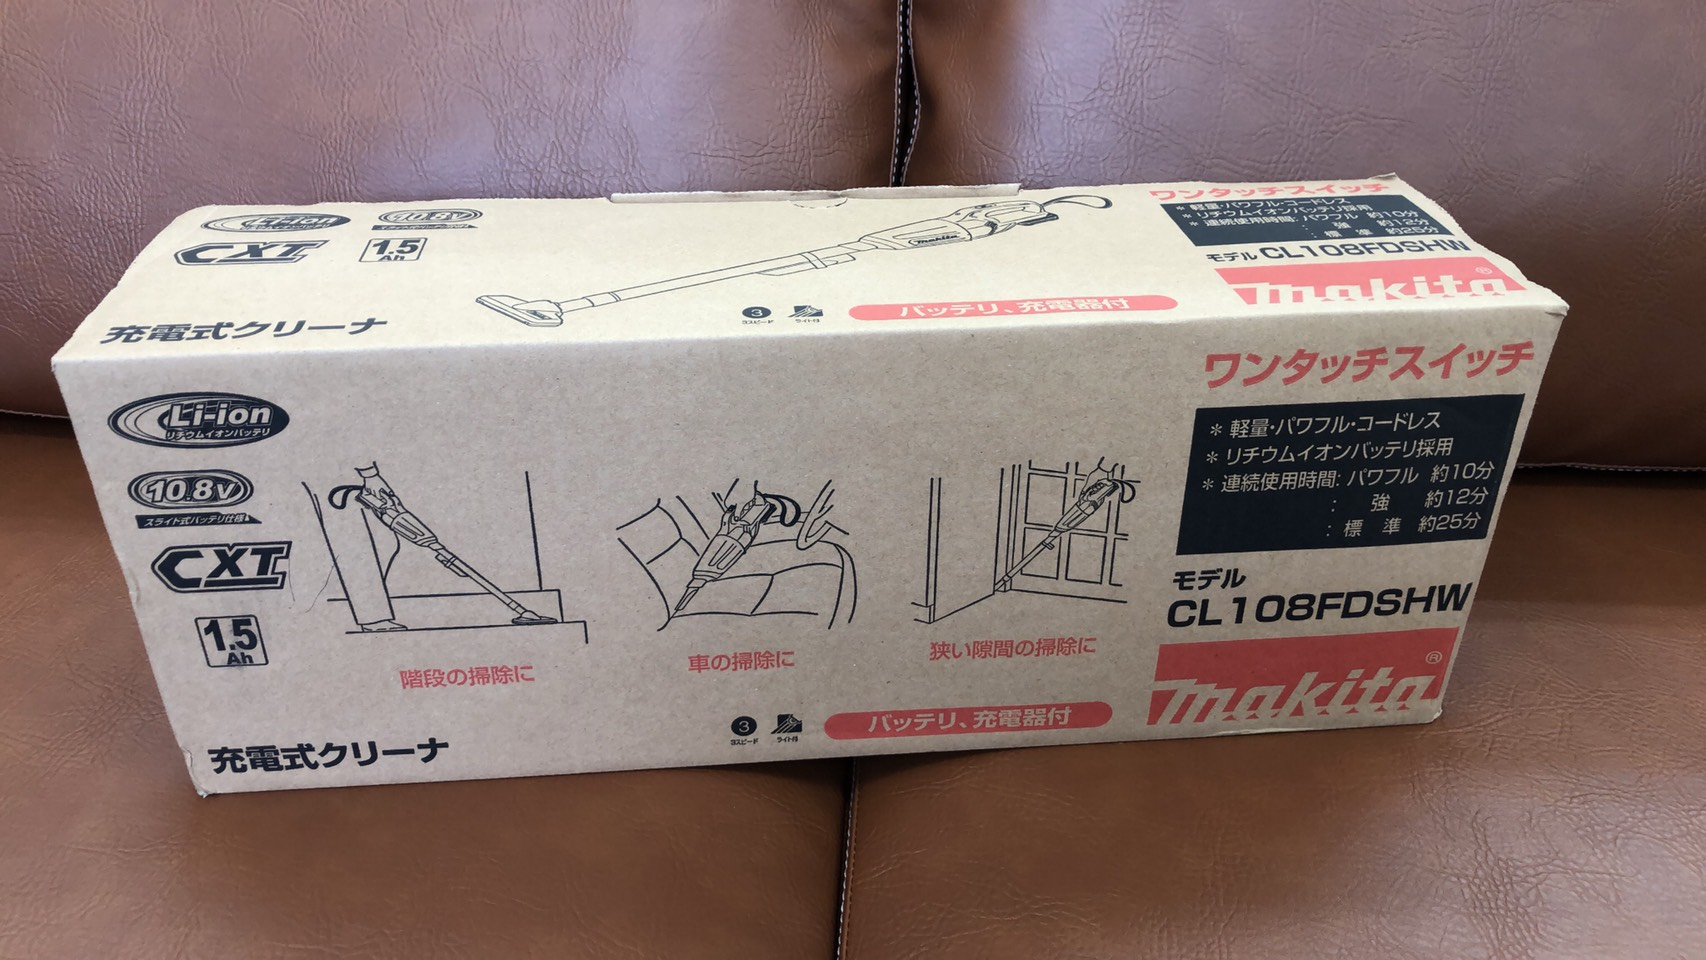 【makita(マキタ)/ 充電式クリーナー / カプセル式+ワンタッチスイッチ / CL108FDSHW】買い取りさせて頂きました!の買取-